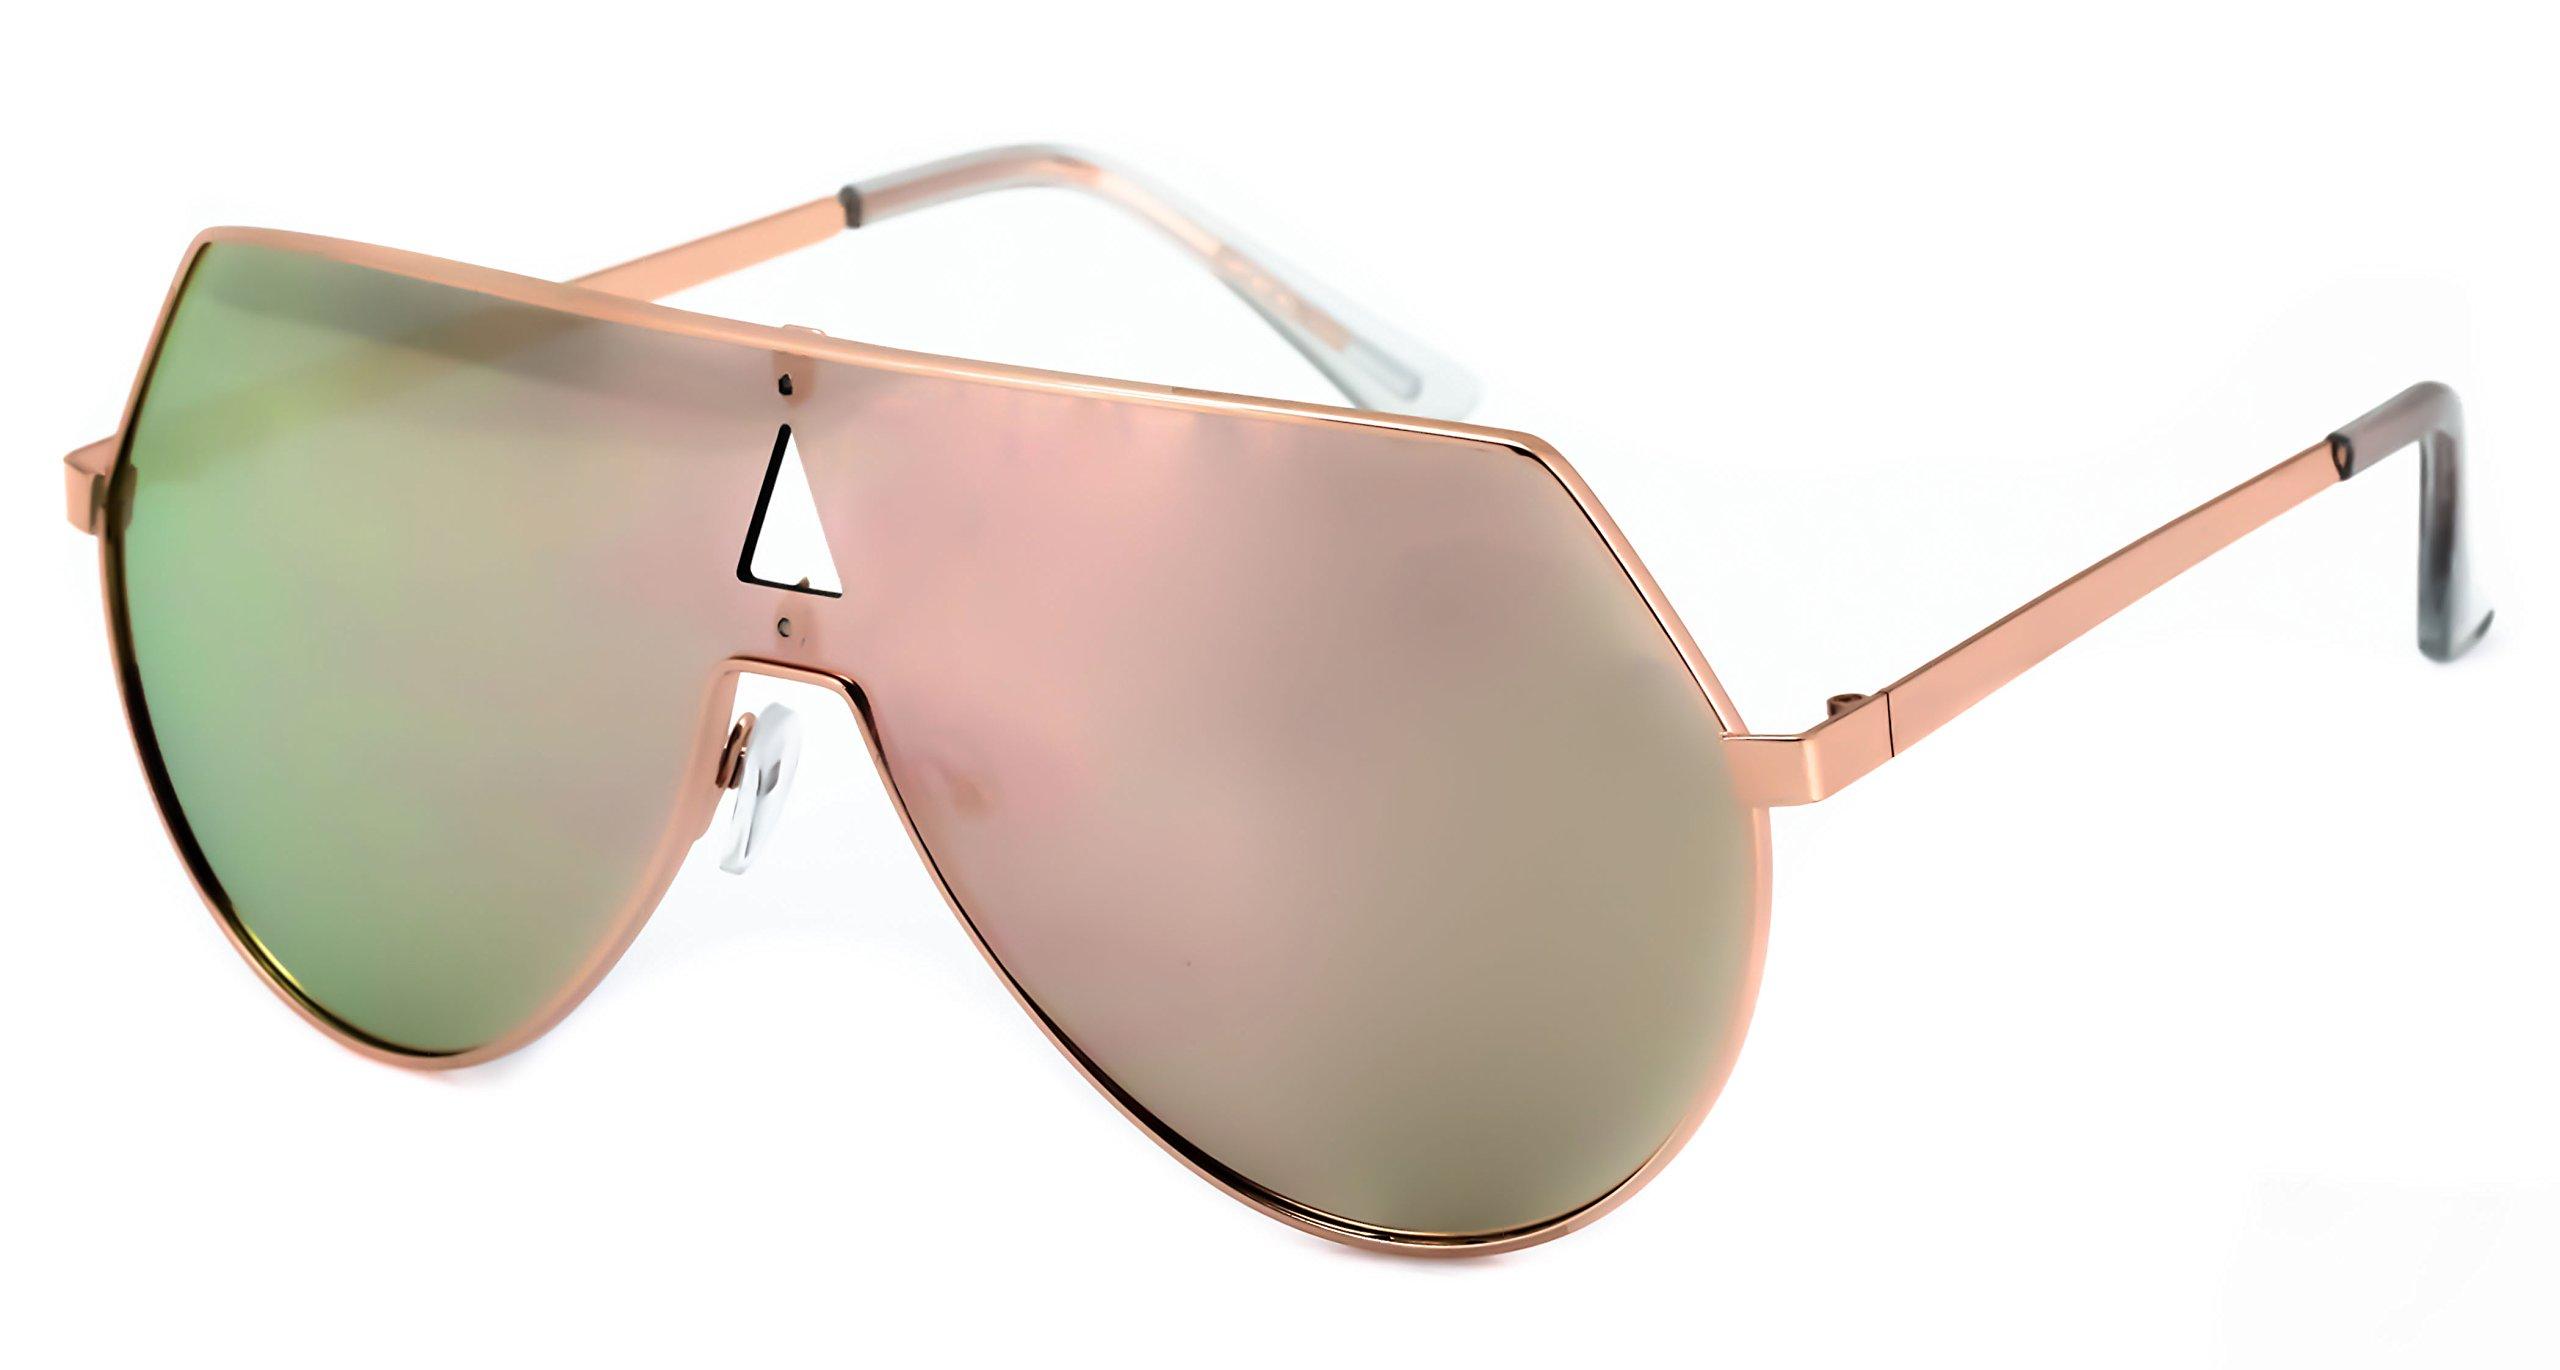 Elite Oversize Unisex Flat Top Aviator Retro Shield Mirrored Lens Rimless Sunglasses (Rose Pink Mirror, 5.8) by EliteGlasses (Image #4)